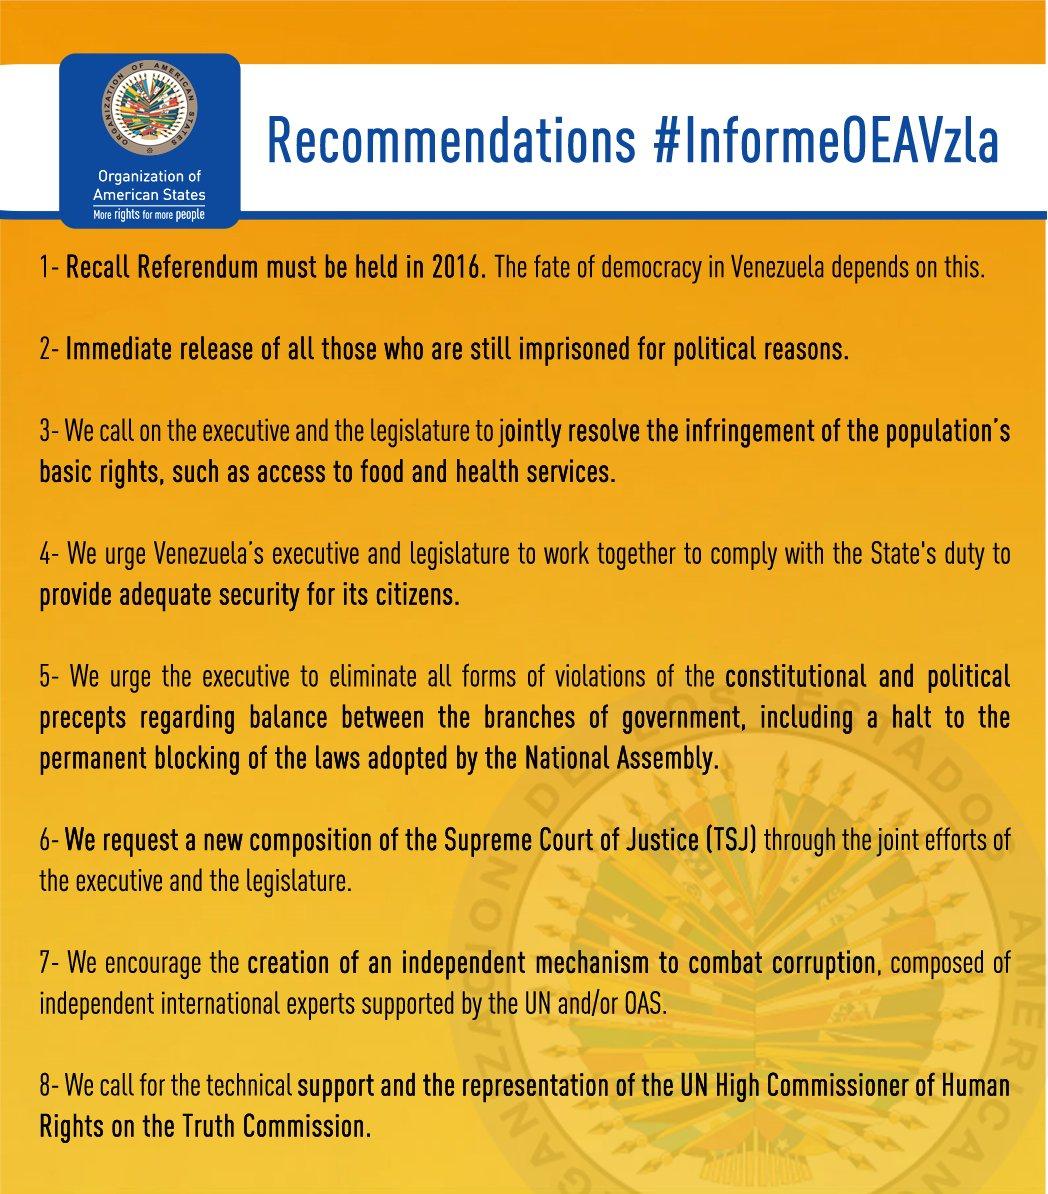 .@Almagro_OEA2015 recommendations to overcome crisis #Venezuela https://t.co/DRErmr99Lp #InformeOEAVzla https://t.co/E0CBezuG3Q